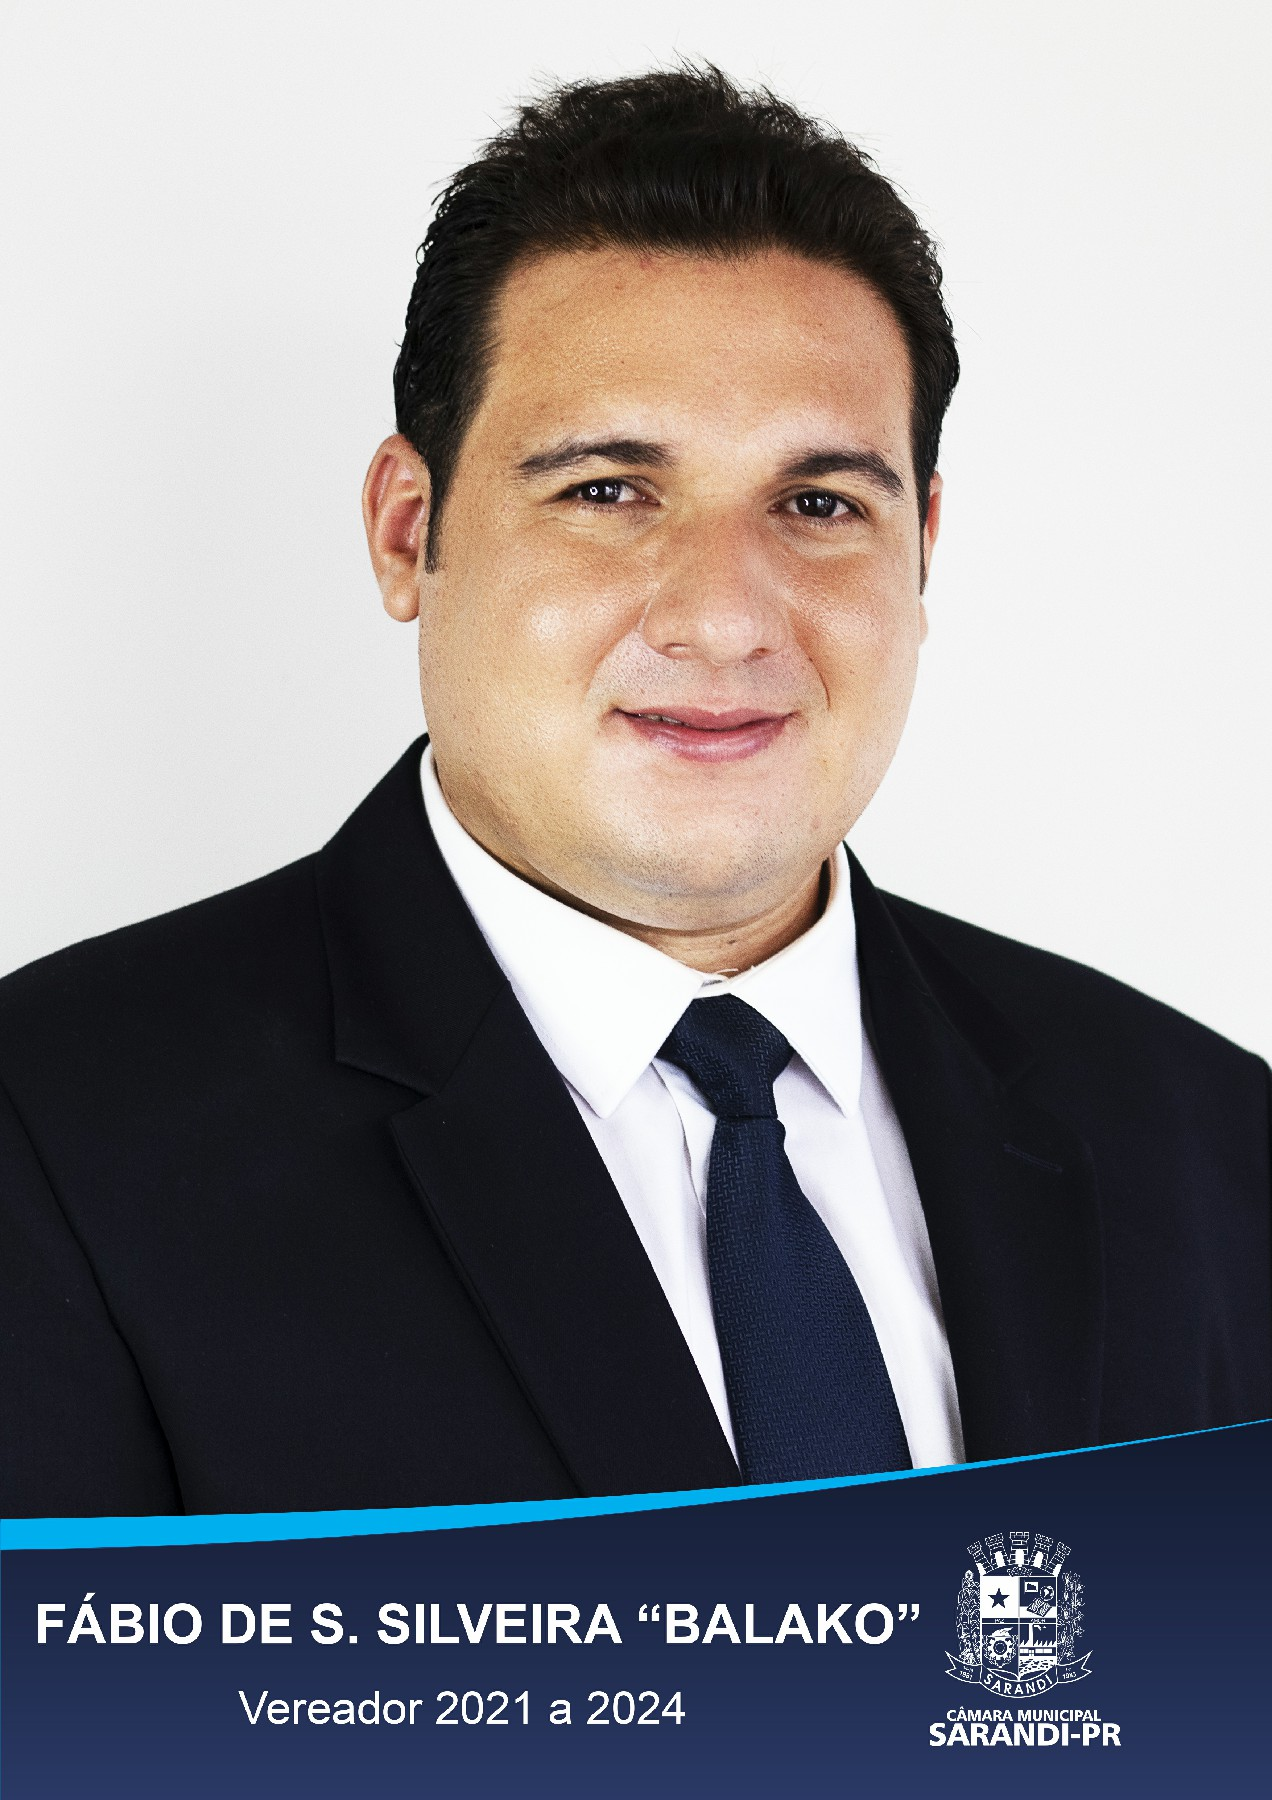 Fábio de Souza Silveira - Fábio Balako